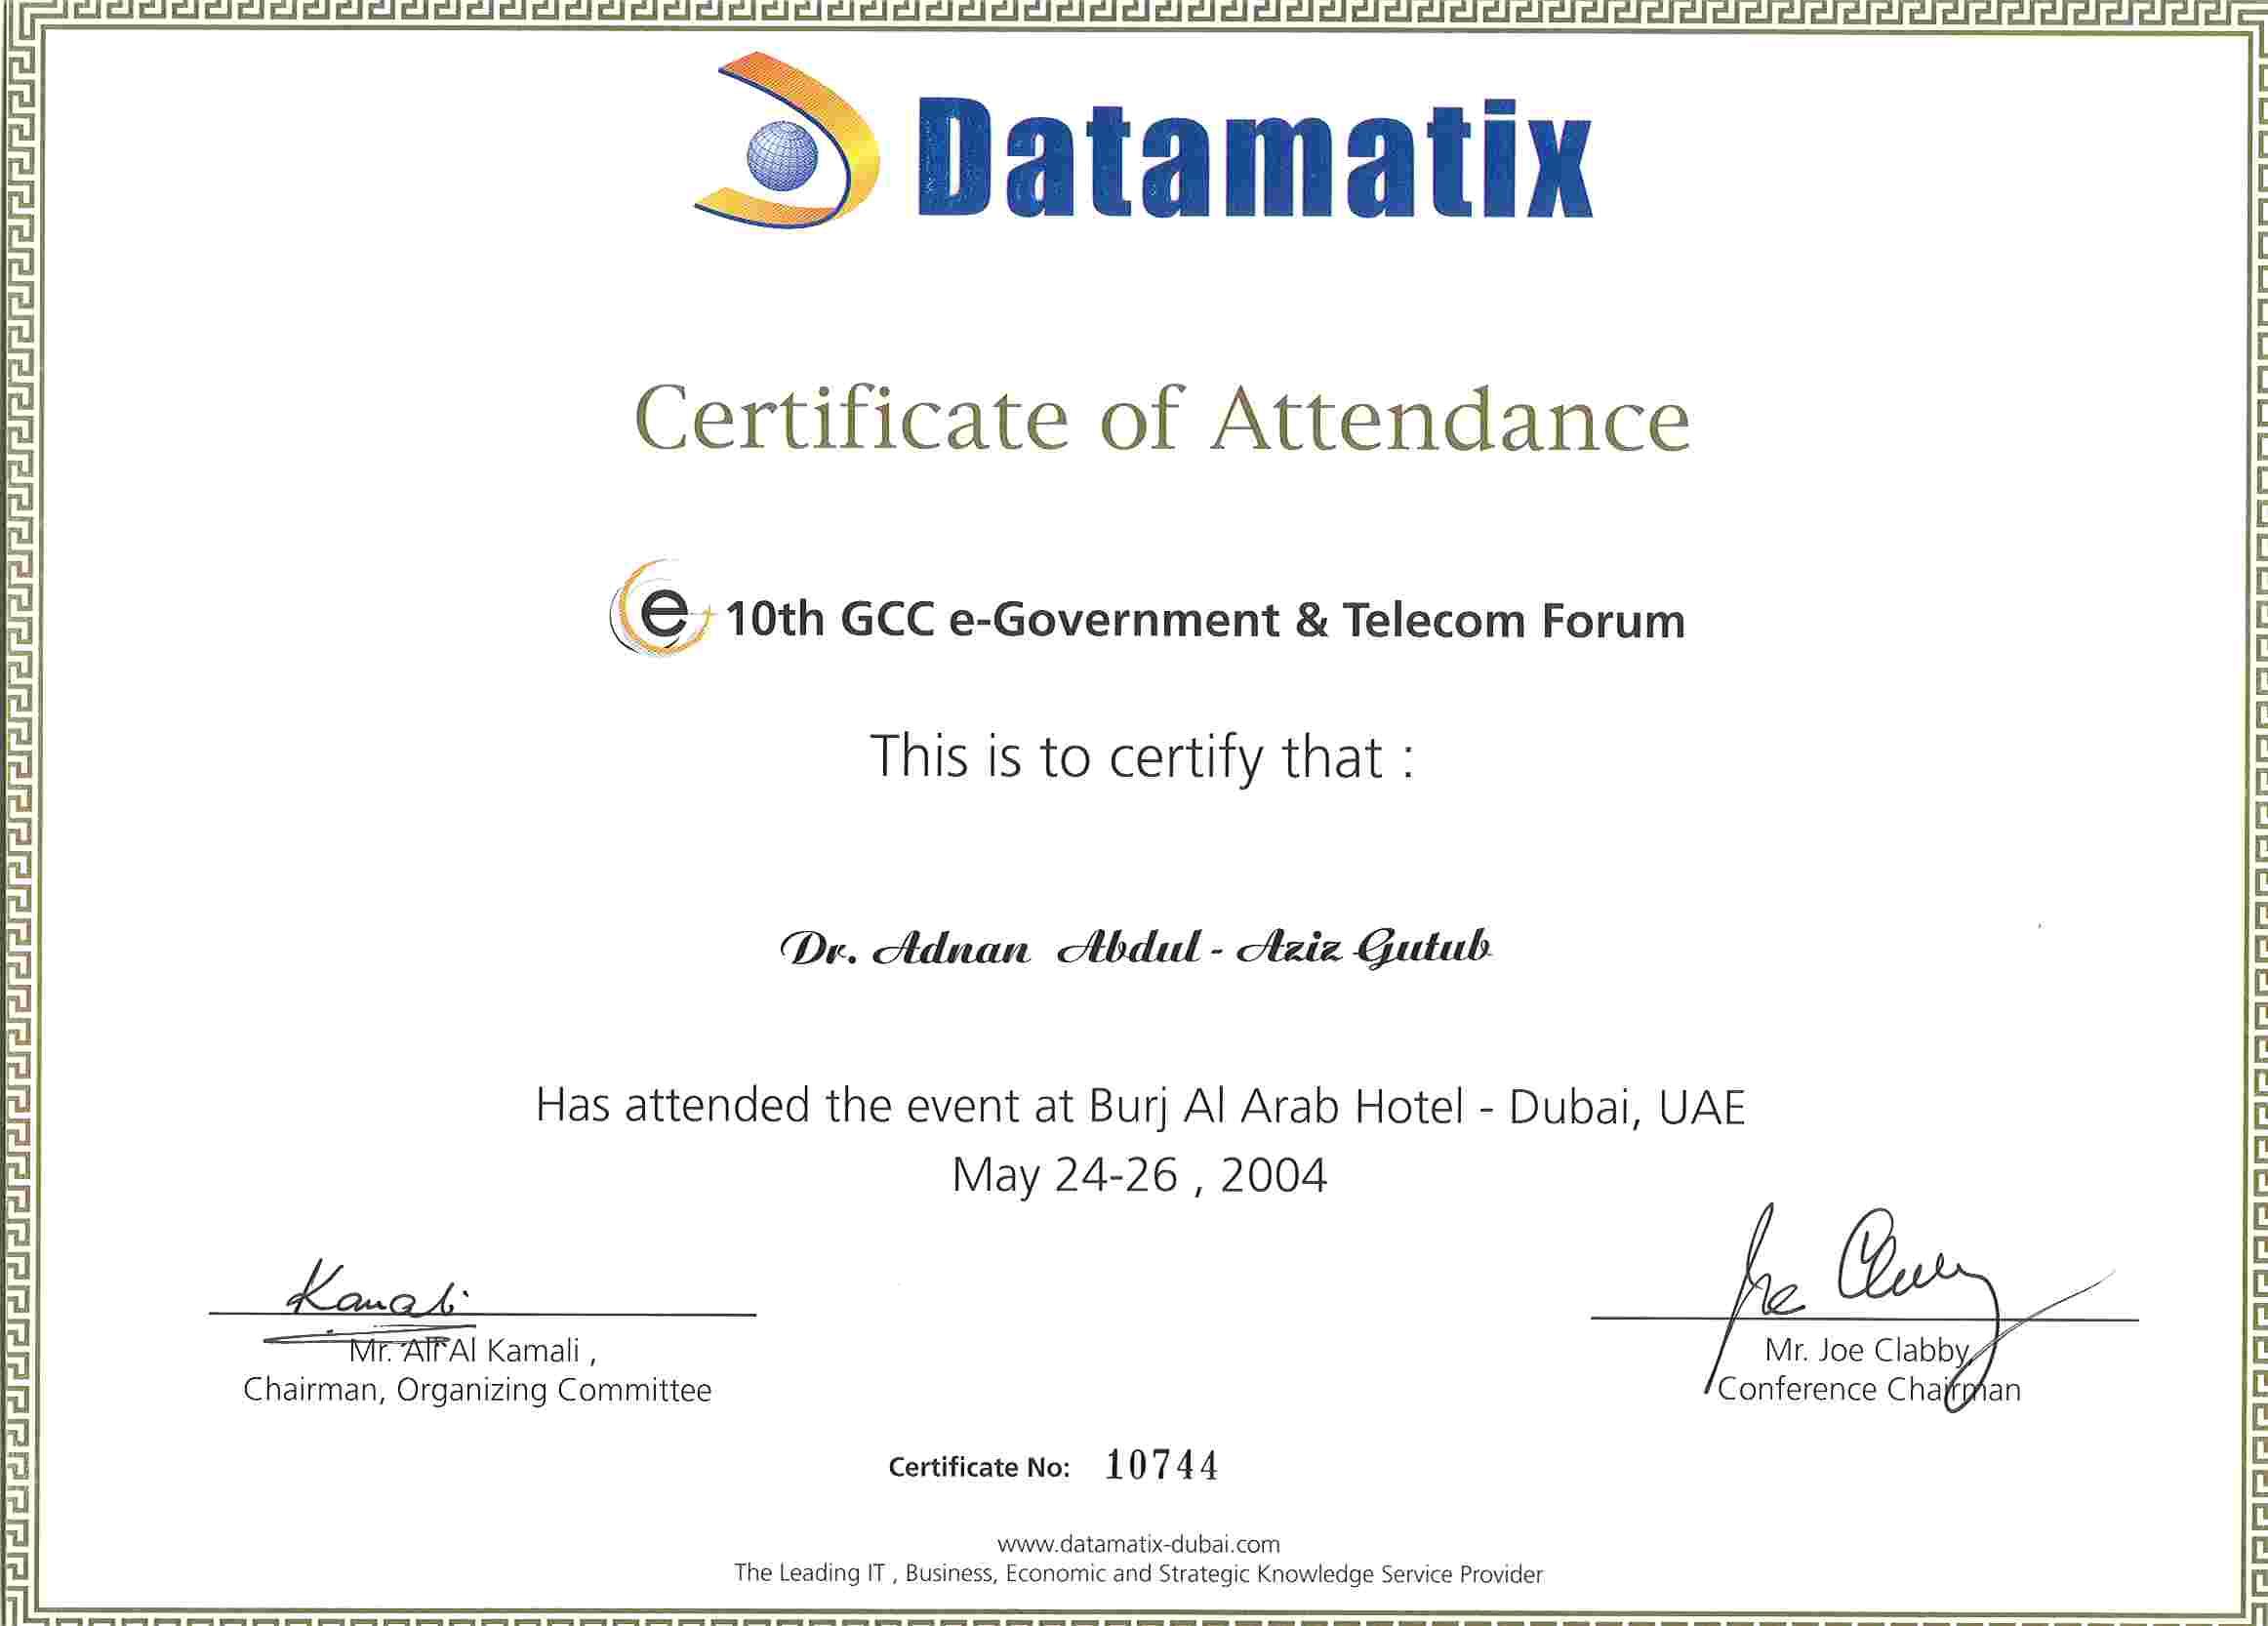 Dr adnan gutub resume represented kfupm in the tenth gcc e government tele com forum 2004 dubai uae certificate spiritdancerdesigns Gallery